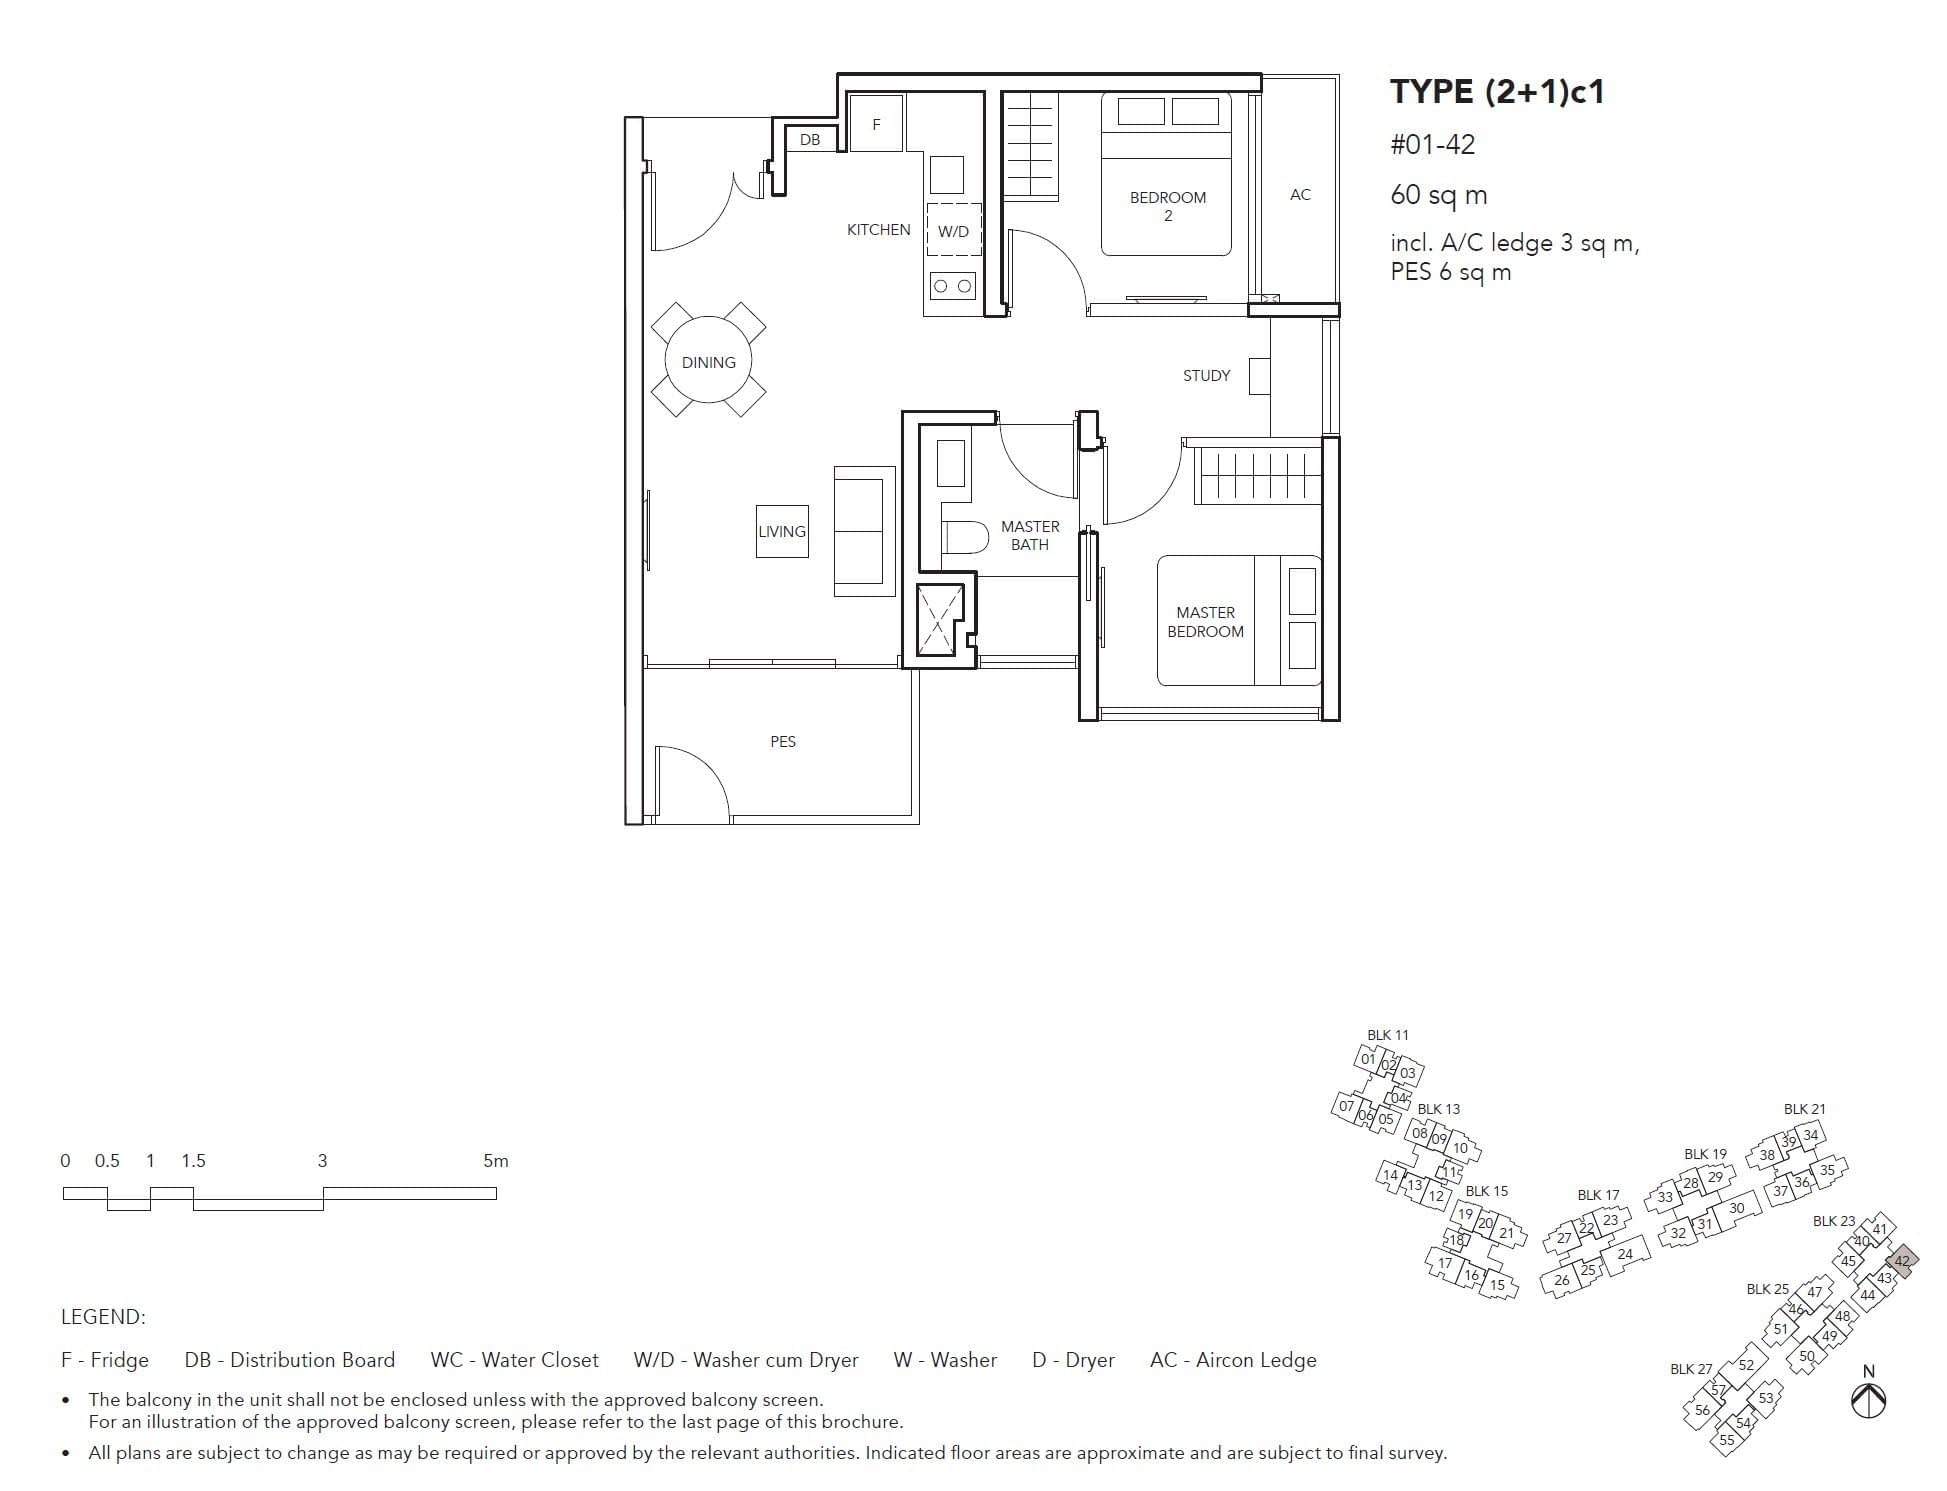 Jovell Jovell Floorplan 21c1